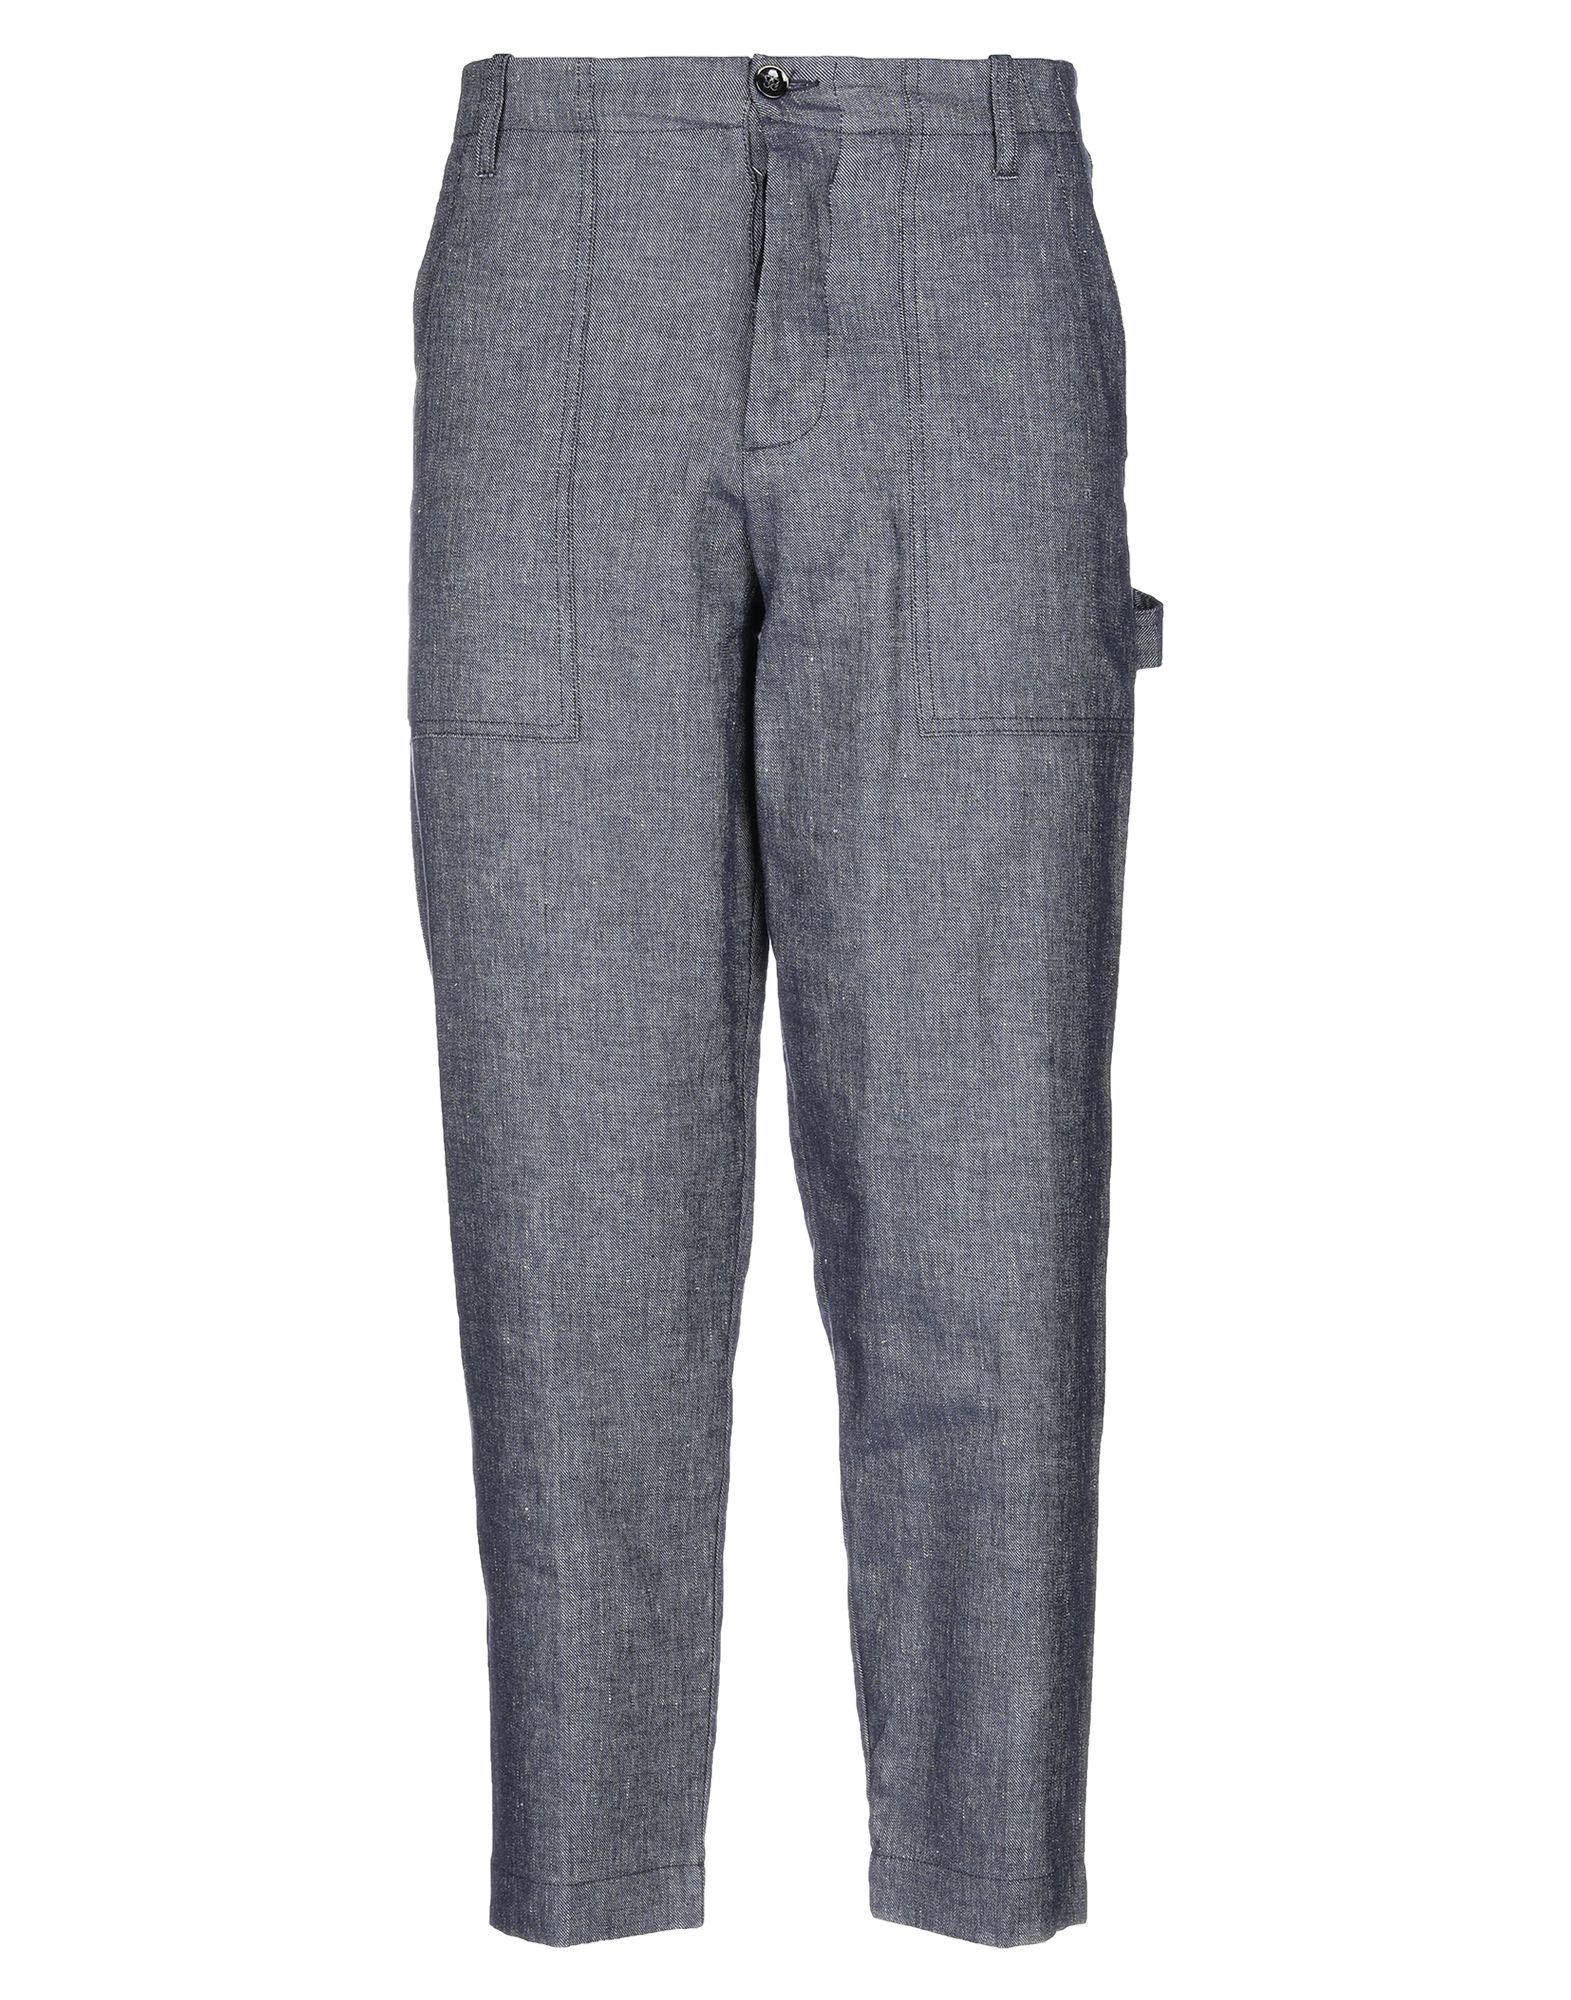 PAOLO PECORA Джинсовые брюки paolo casalini пиджак